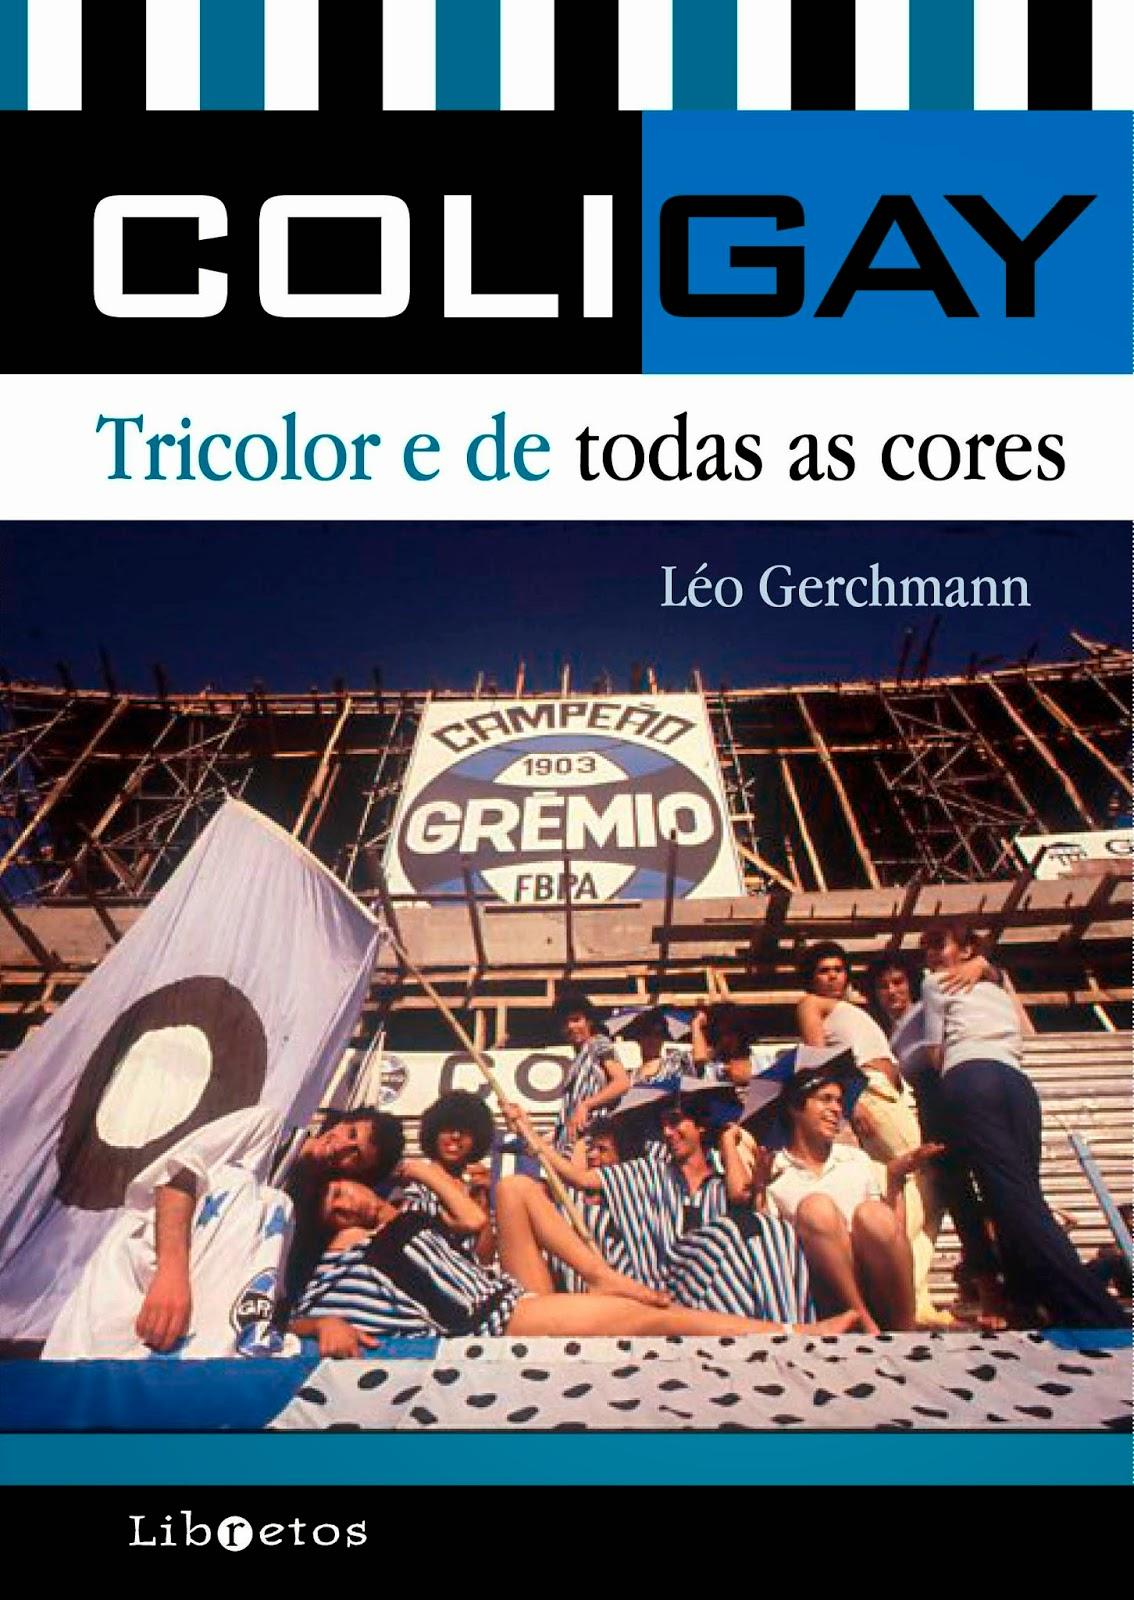 cb1c8c2216 Literatura na Arquibancada  Coligay  Tricolor e de todas as cores